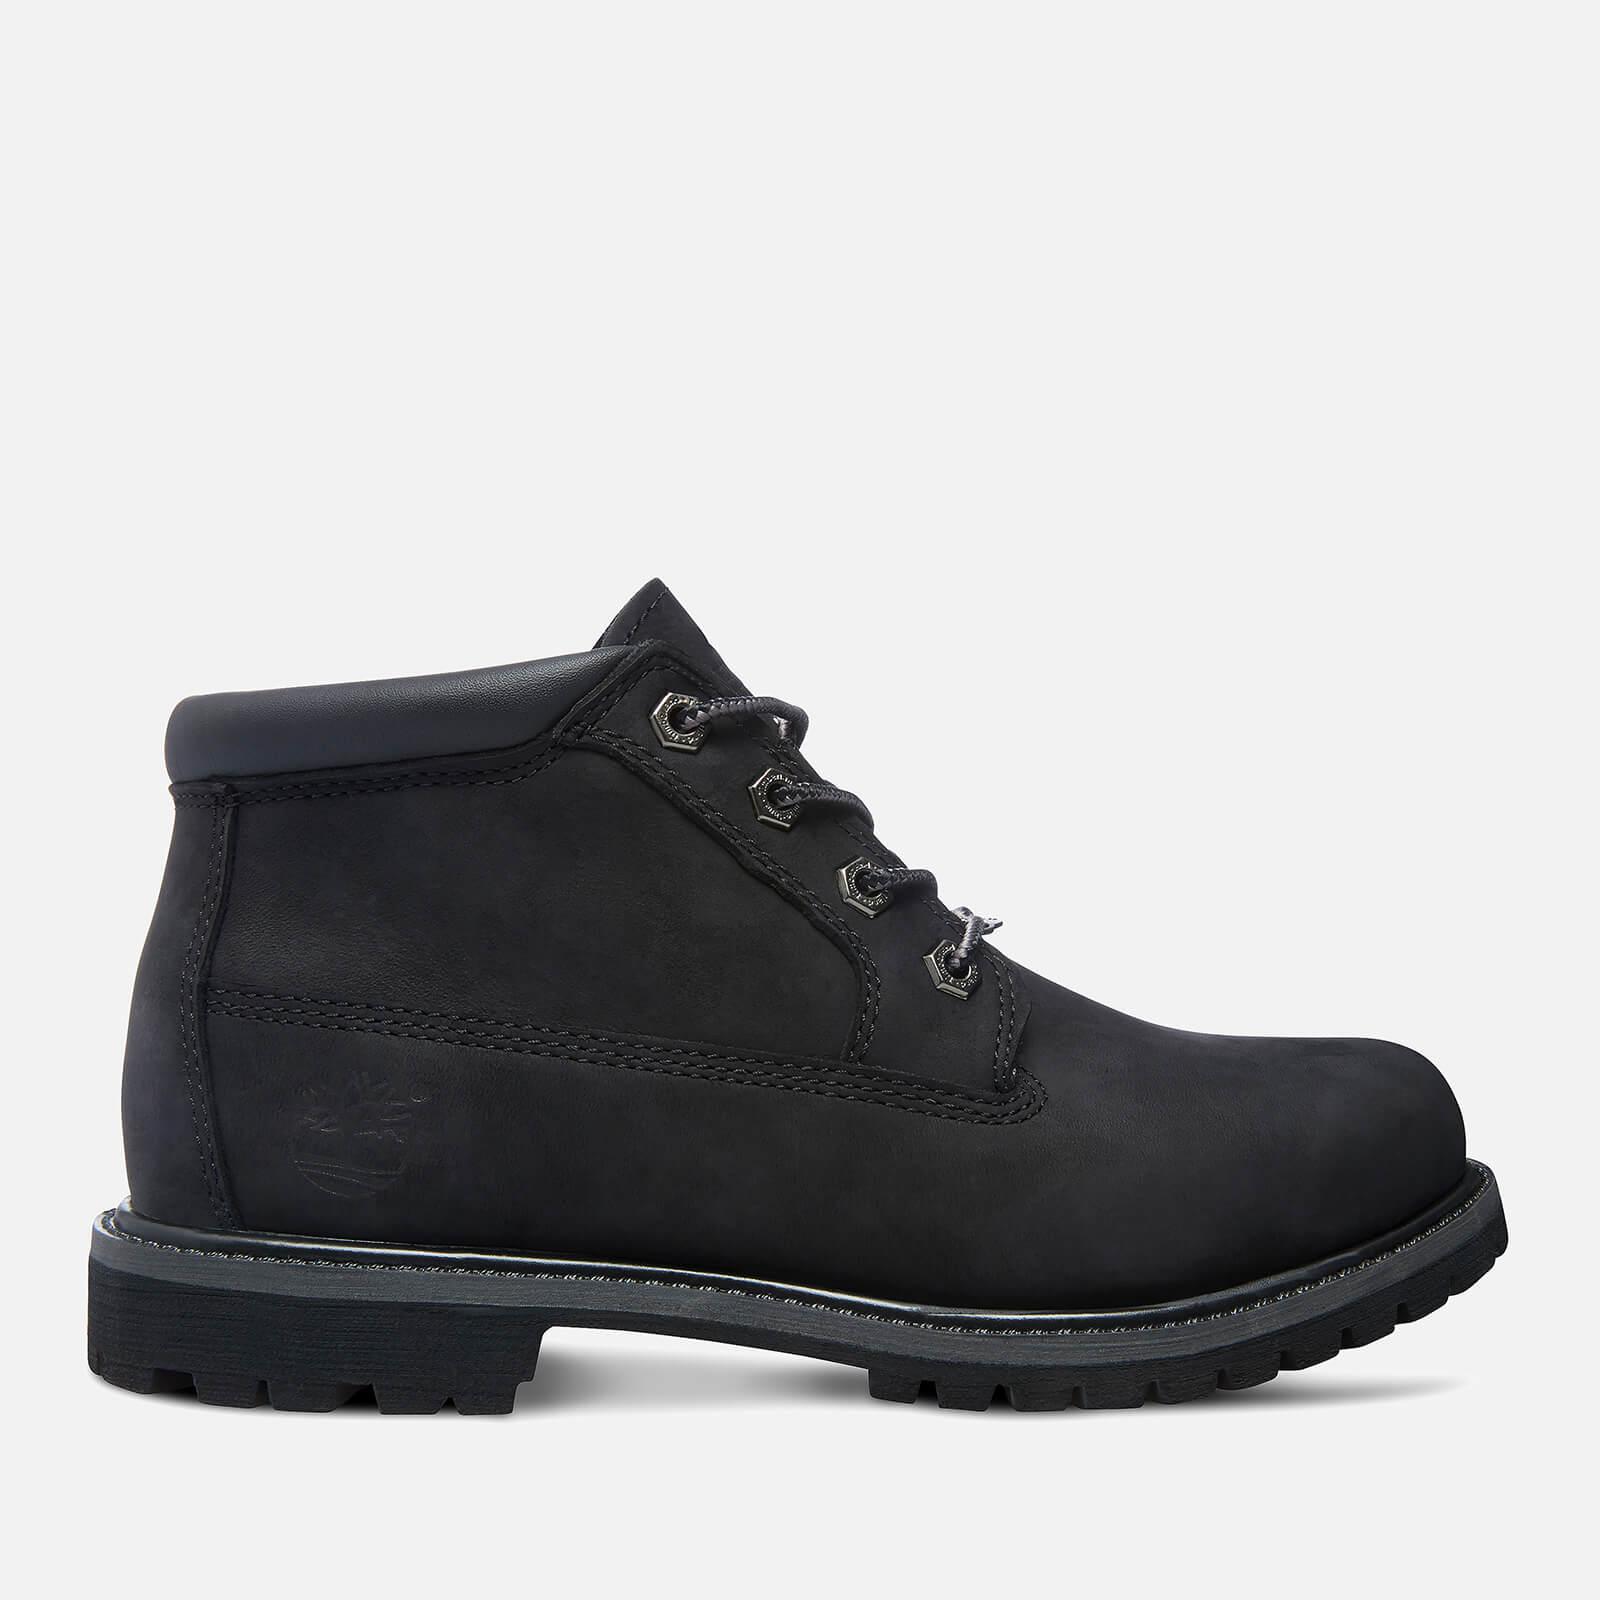 Timberland Women's Nellie Double Leather Chukka Boots - Black - UK 5